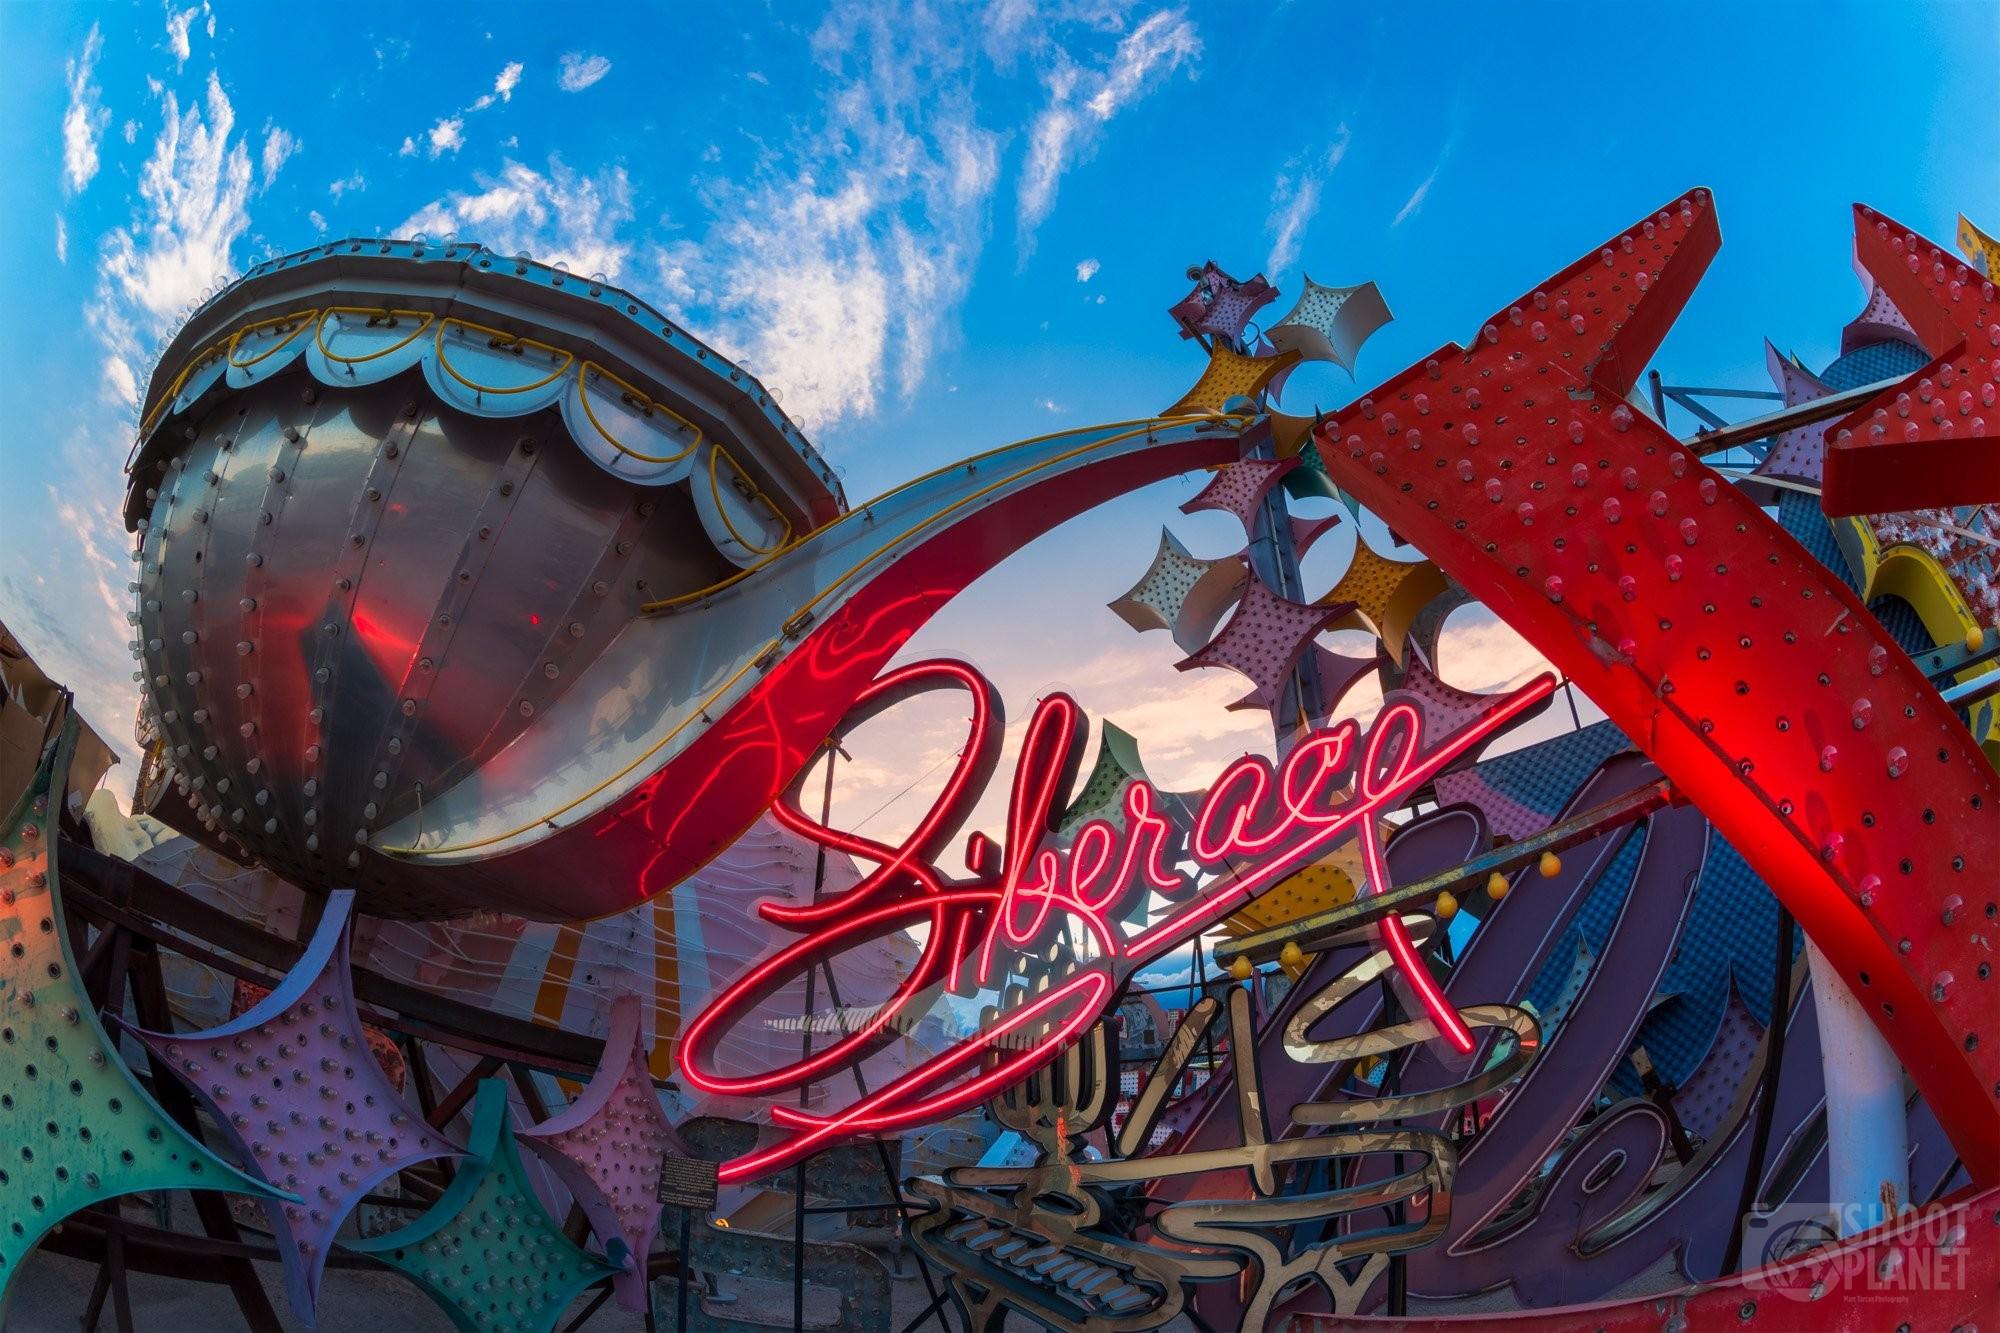 Vintage casino neon sign sunset, Las Vegas